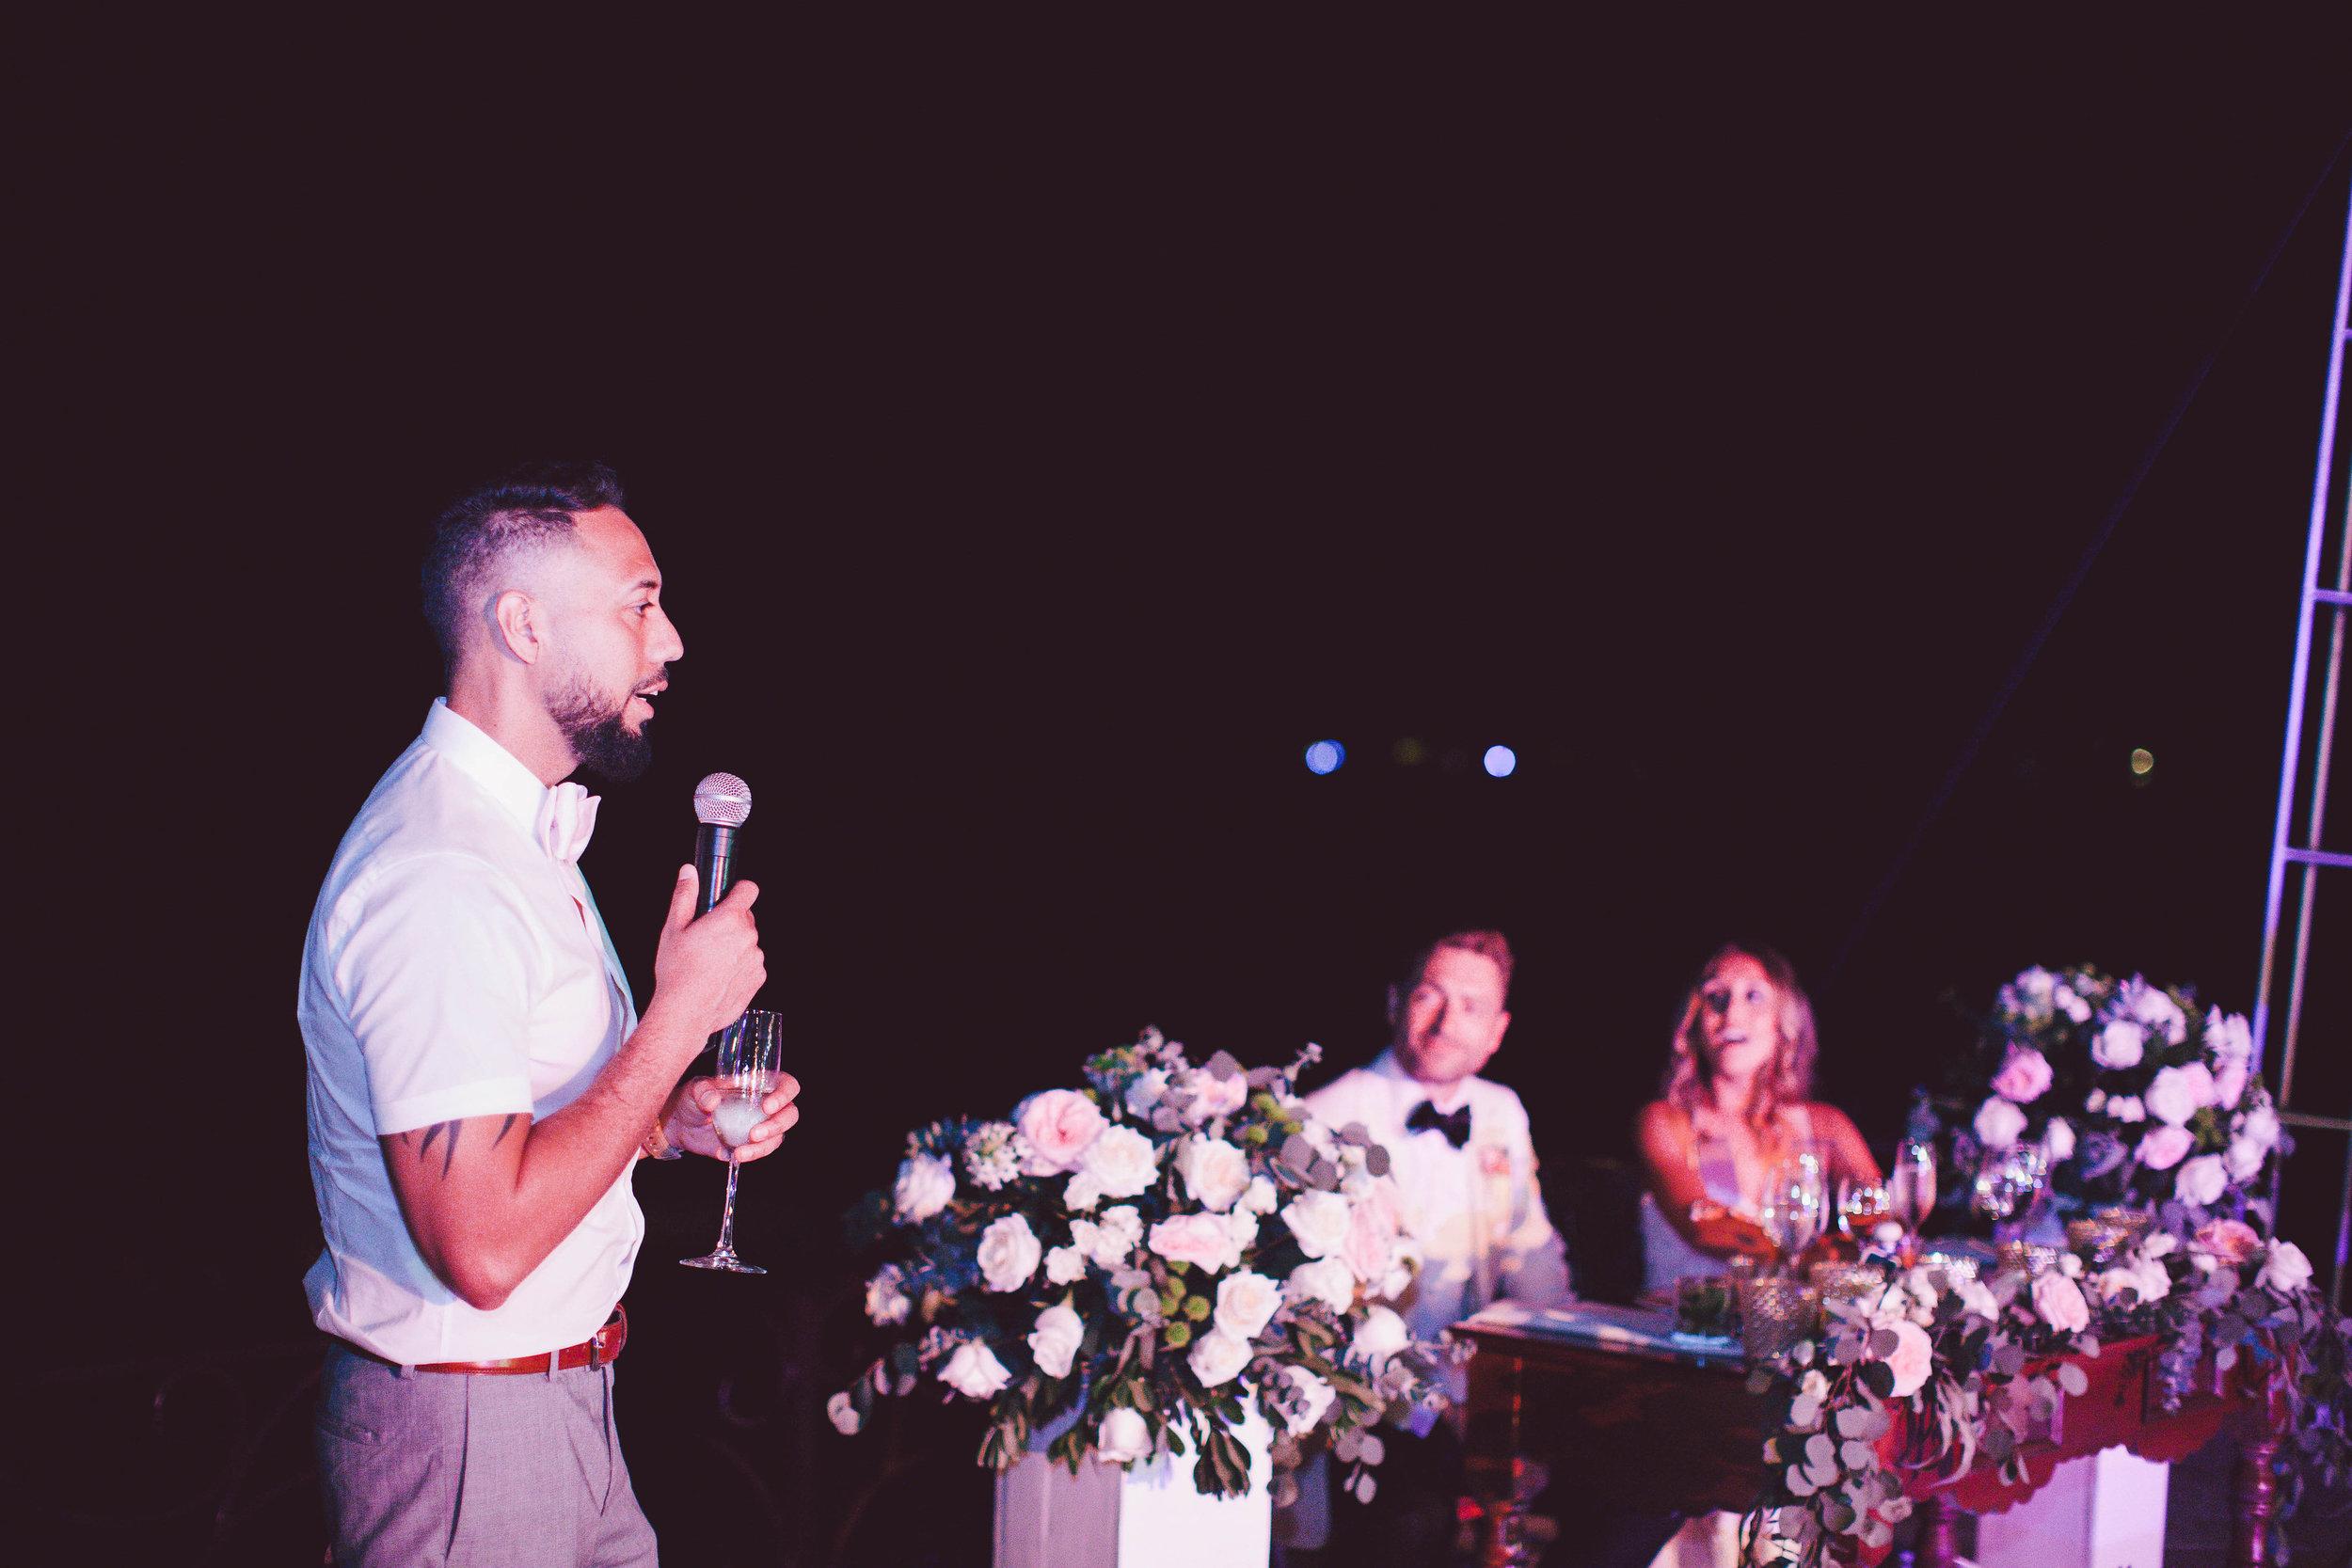 mexico_wedding_cancun_villa_la_joya_evangeline_lane_135.jpg